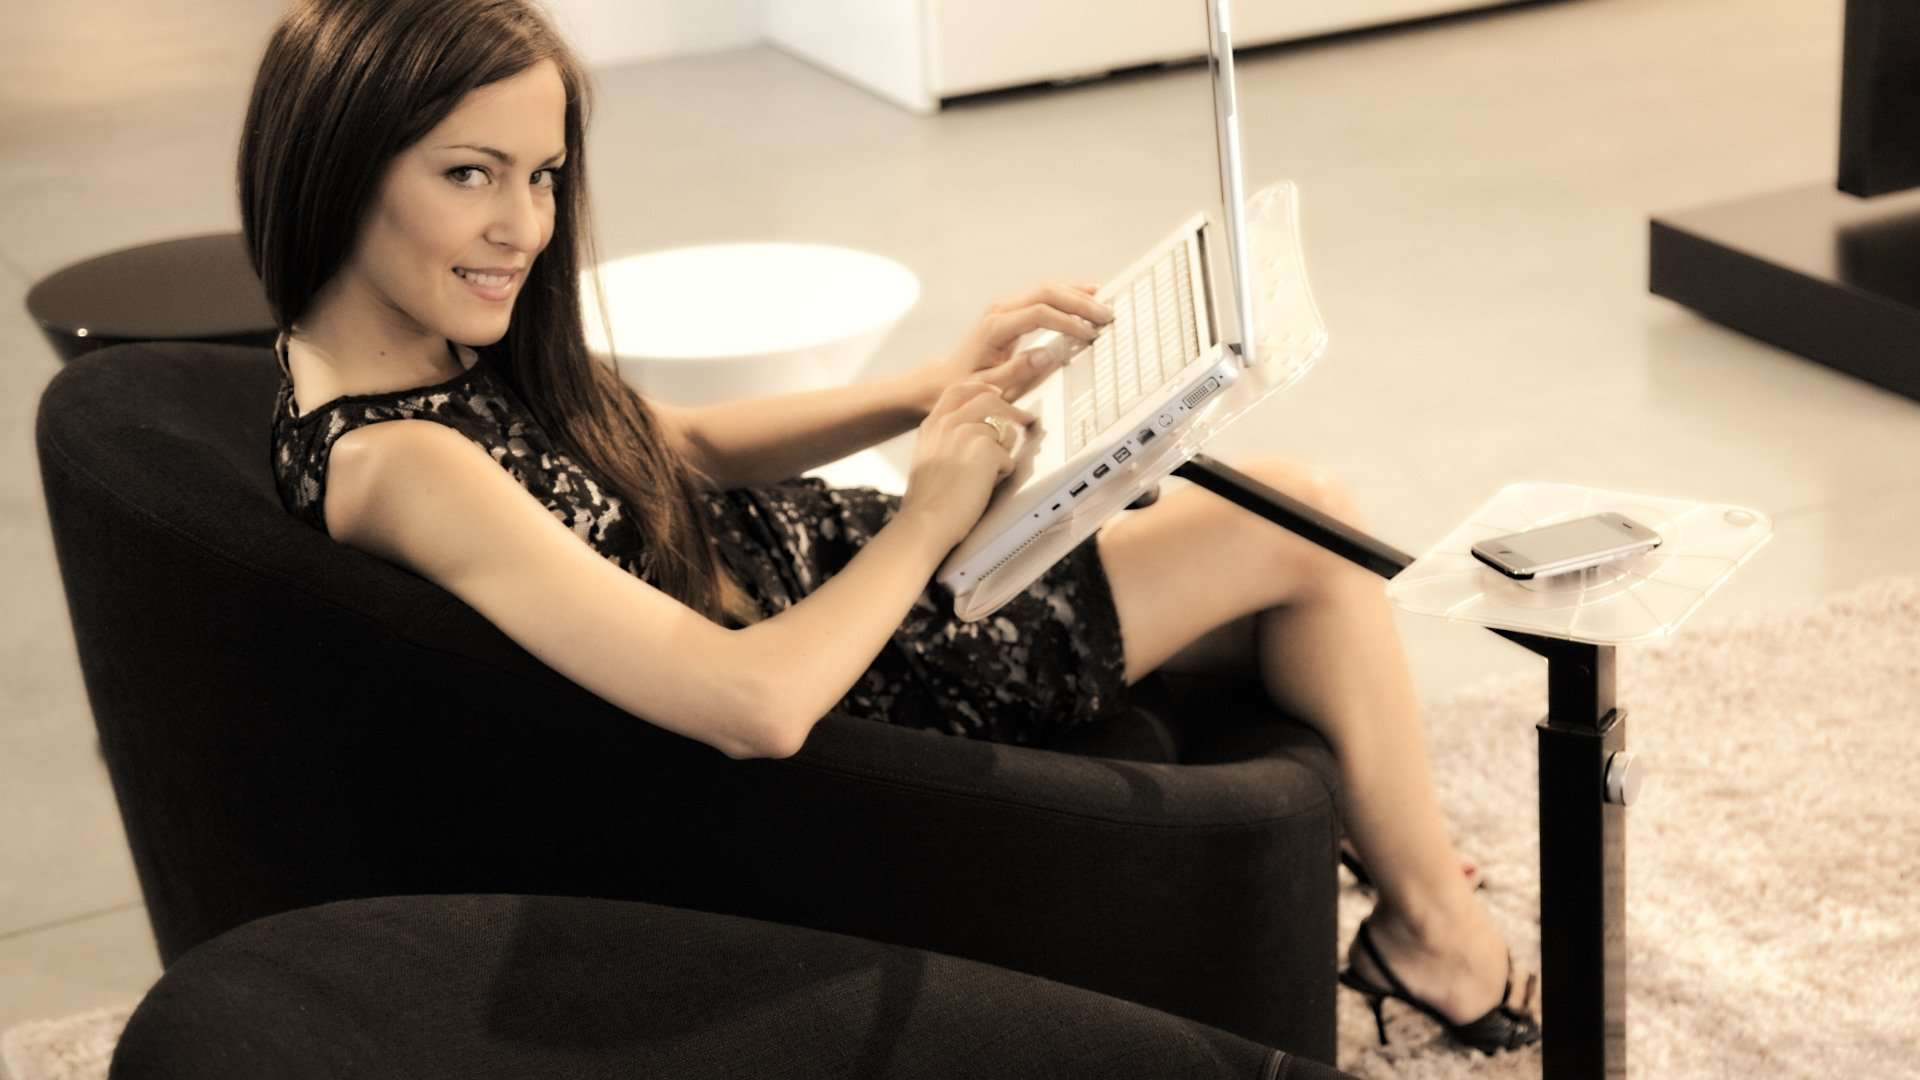 ergonomic comfort using laptop at home